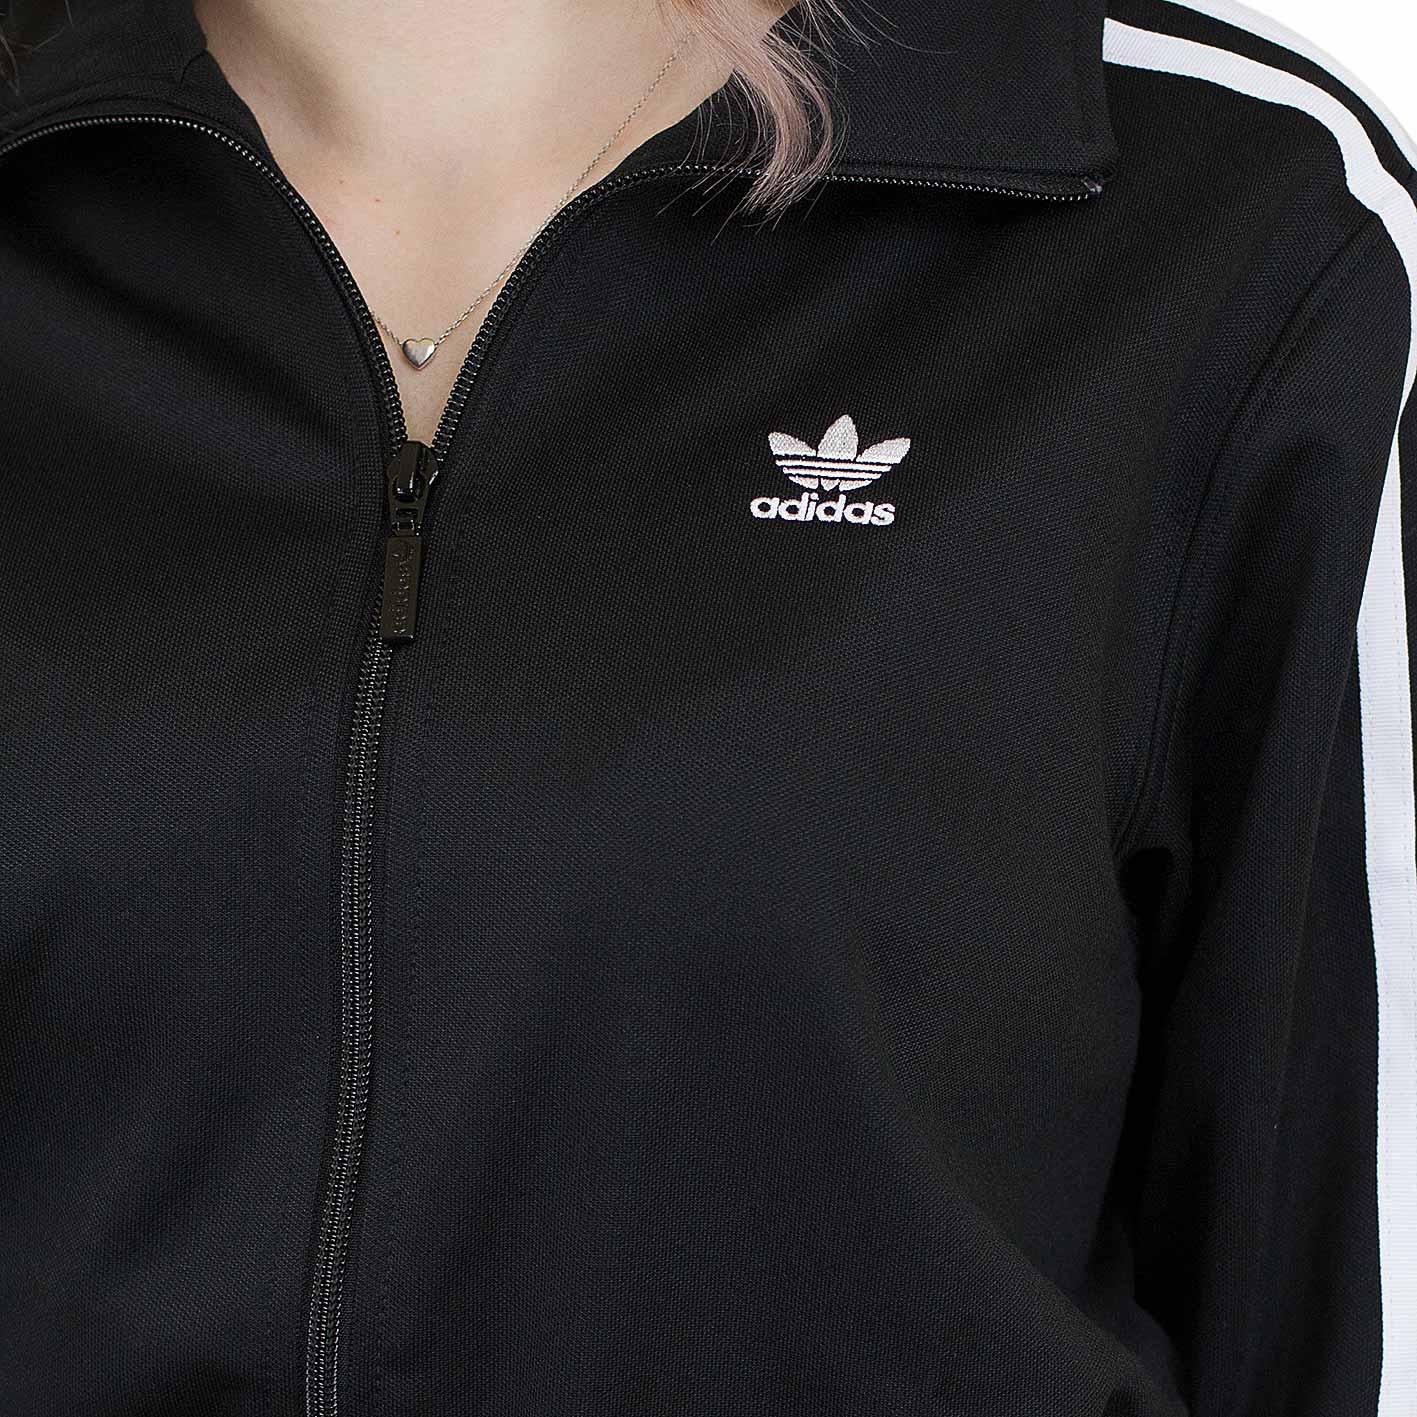 Adidas jacke schwarz weis damen